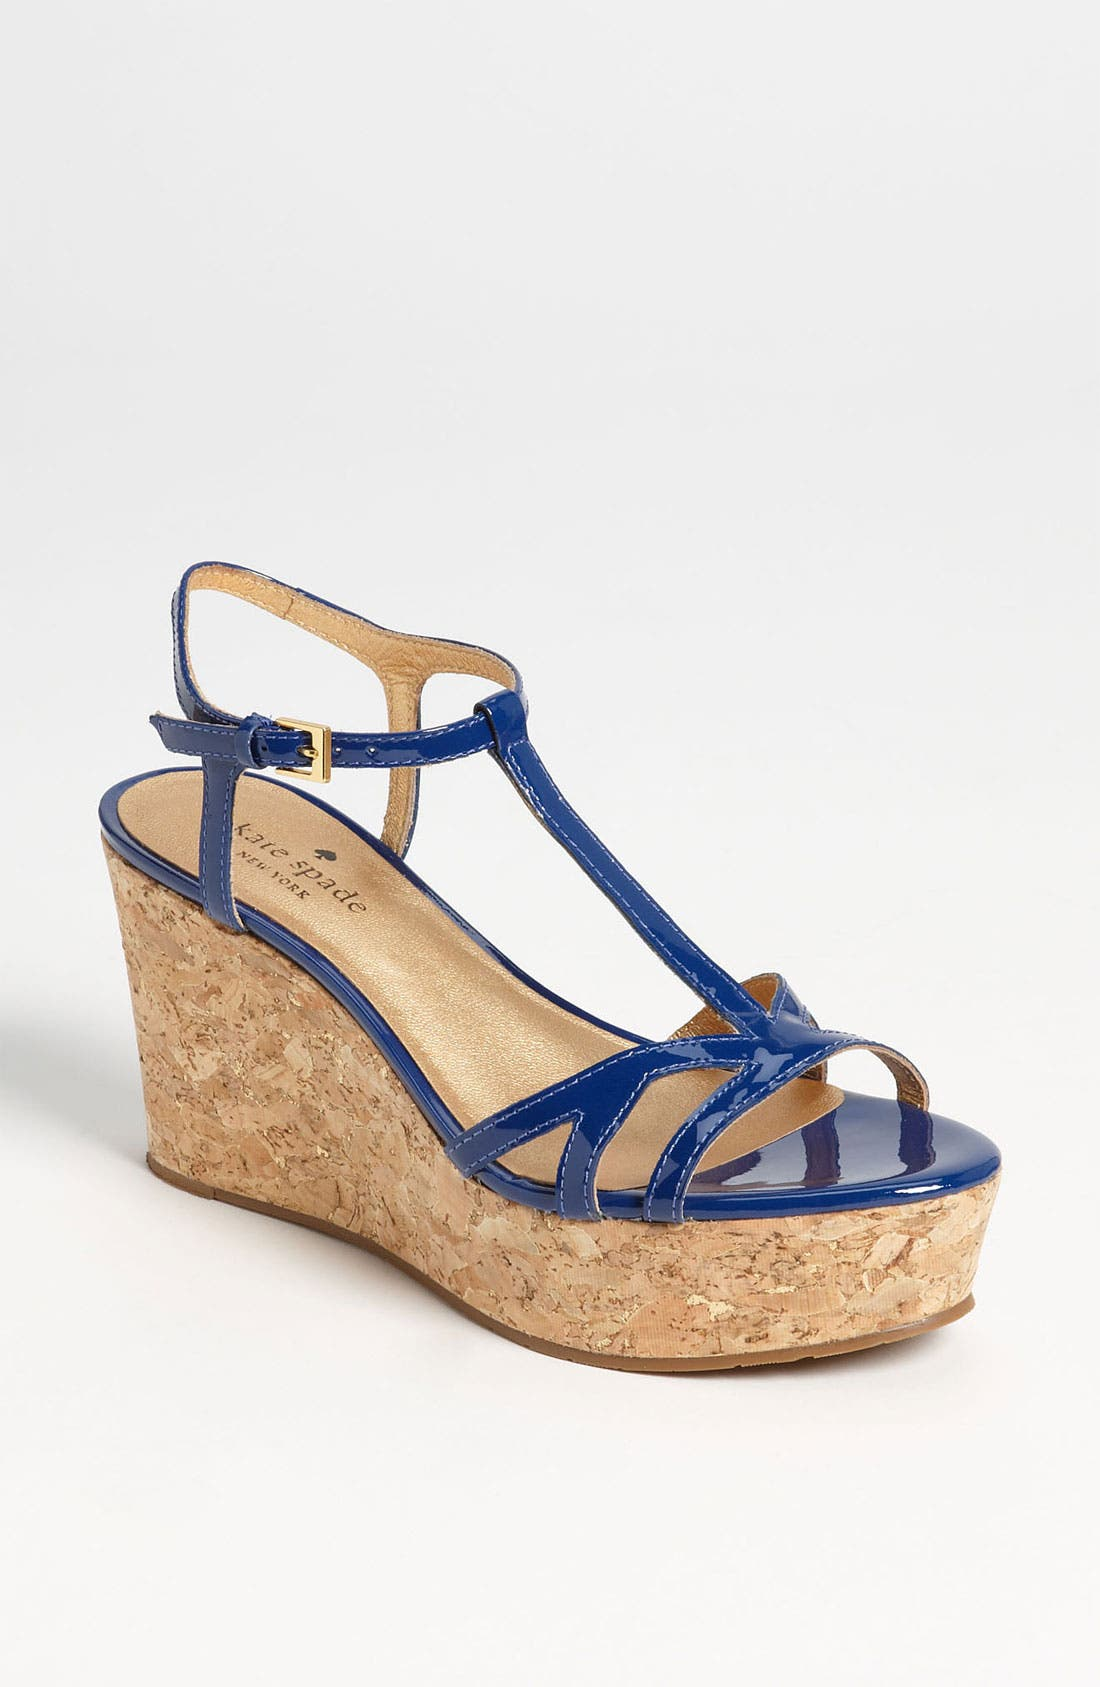 Main Image - kate spade new york 'theodora' sandal